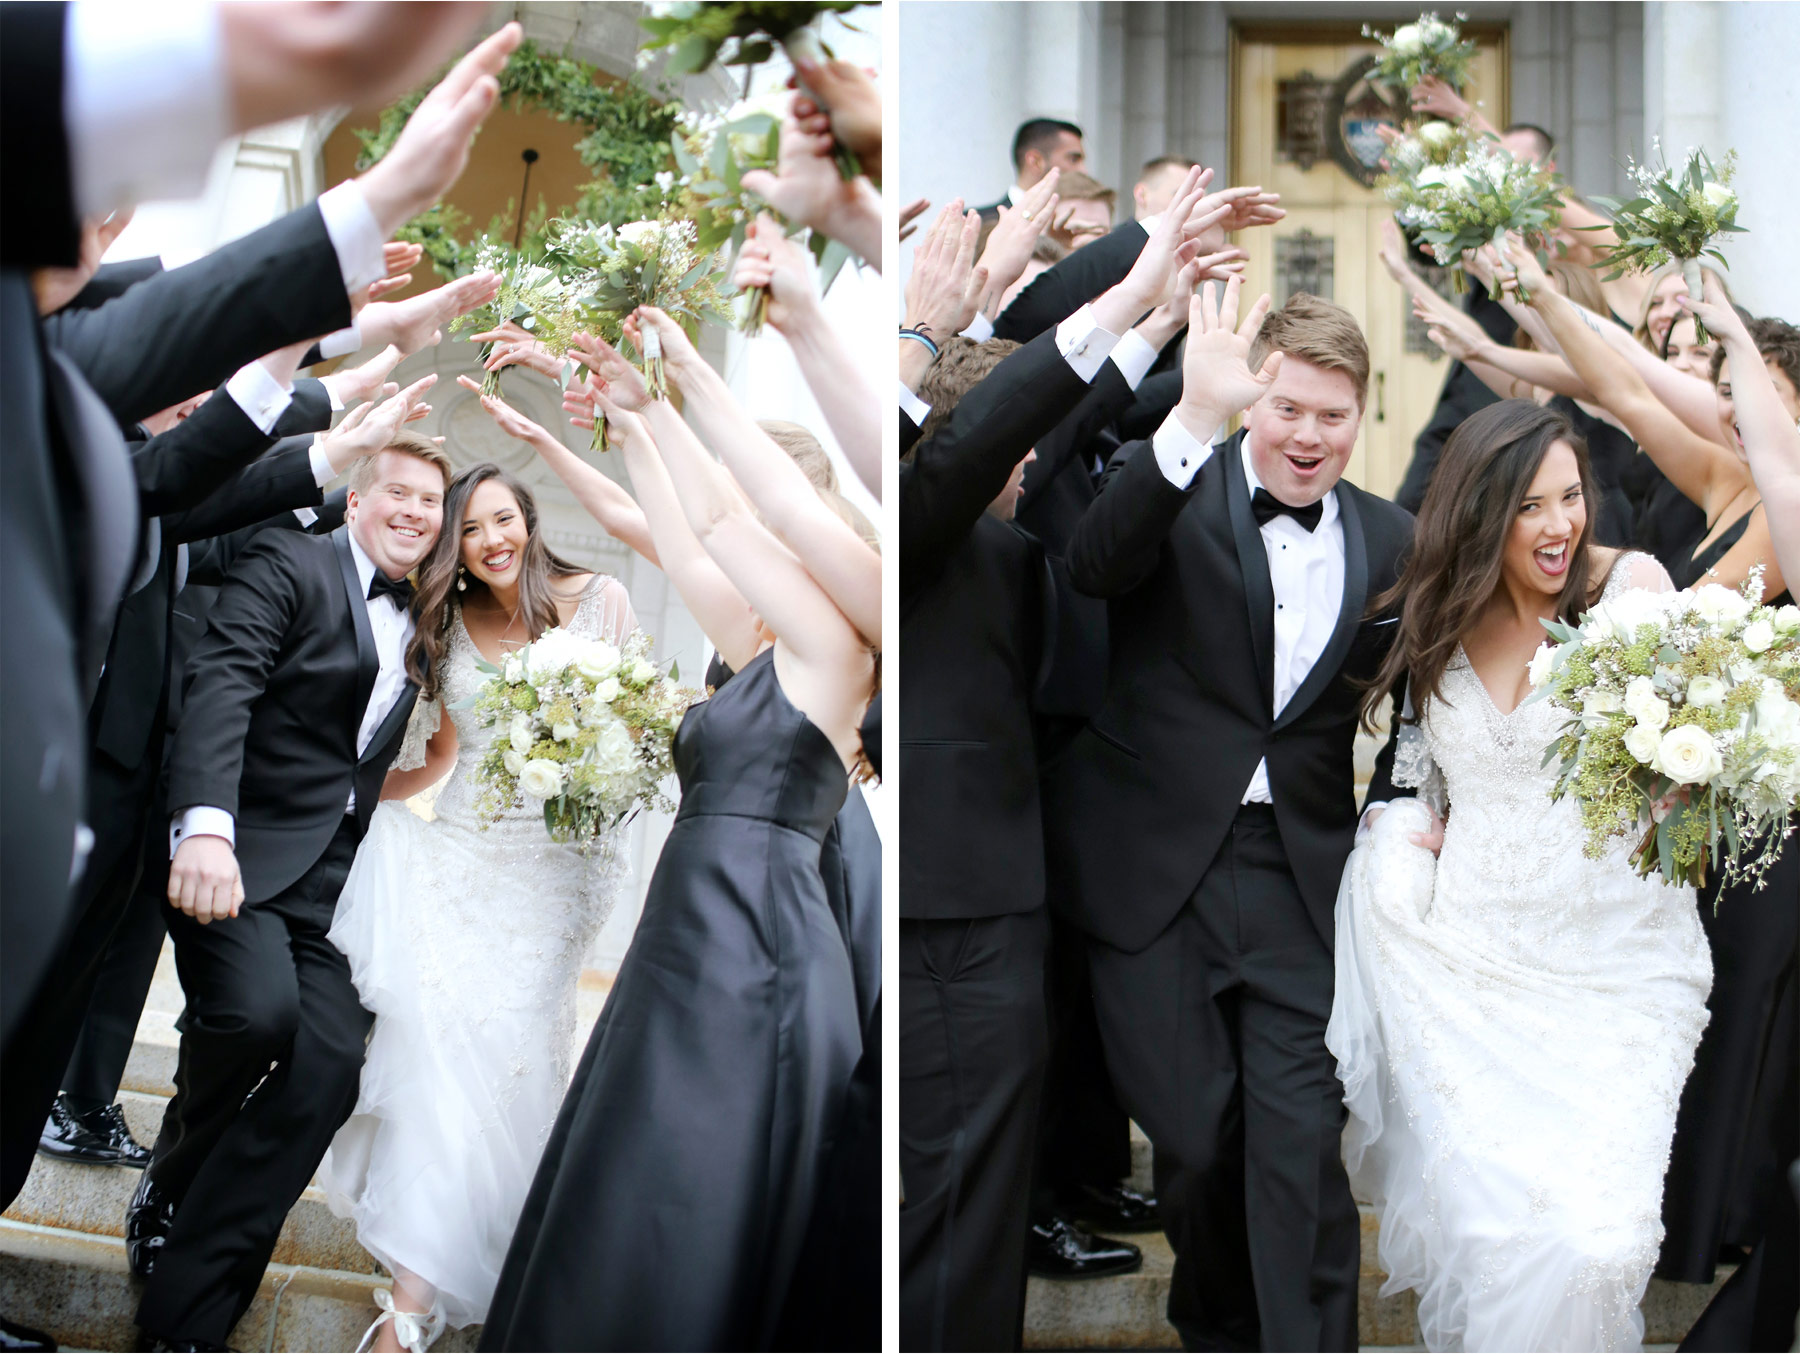 10-Saint-Paul-Minnesota-Wedding-Photography-by-Vick-Photography-Basilica-of-Saint-Mary-Wedding-Party-Group-Winter-Wedding-Sami-and-Nick.jpg